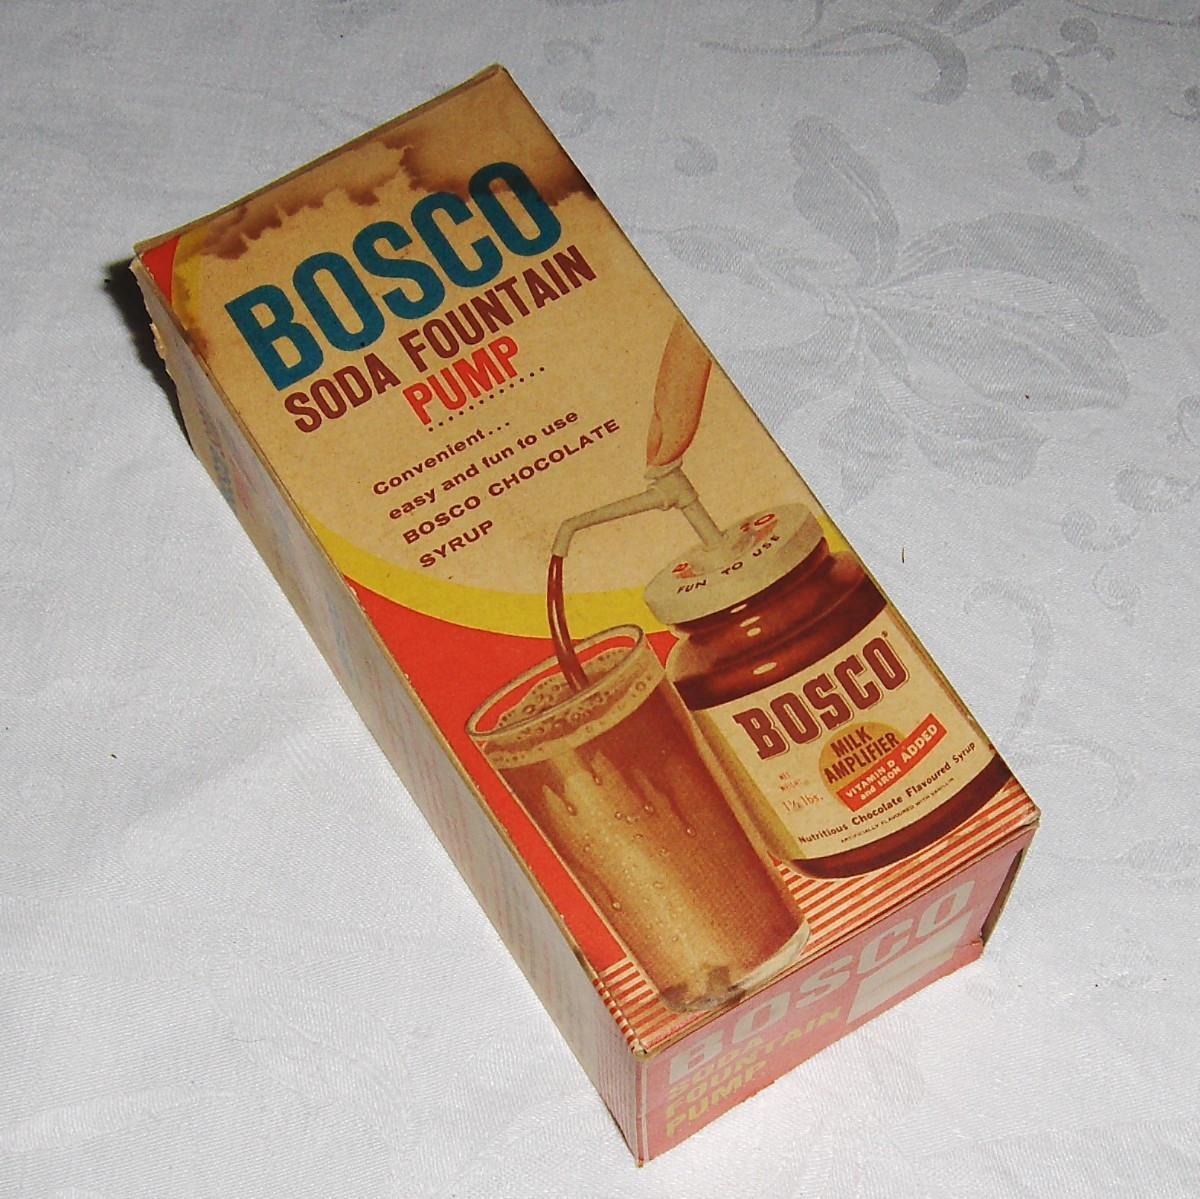 Vintage Bosco Soda Fountain Pump with Original Box from decrepit ...